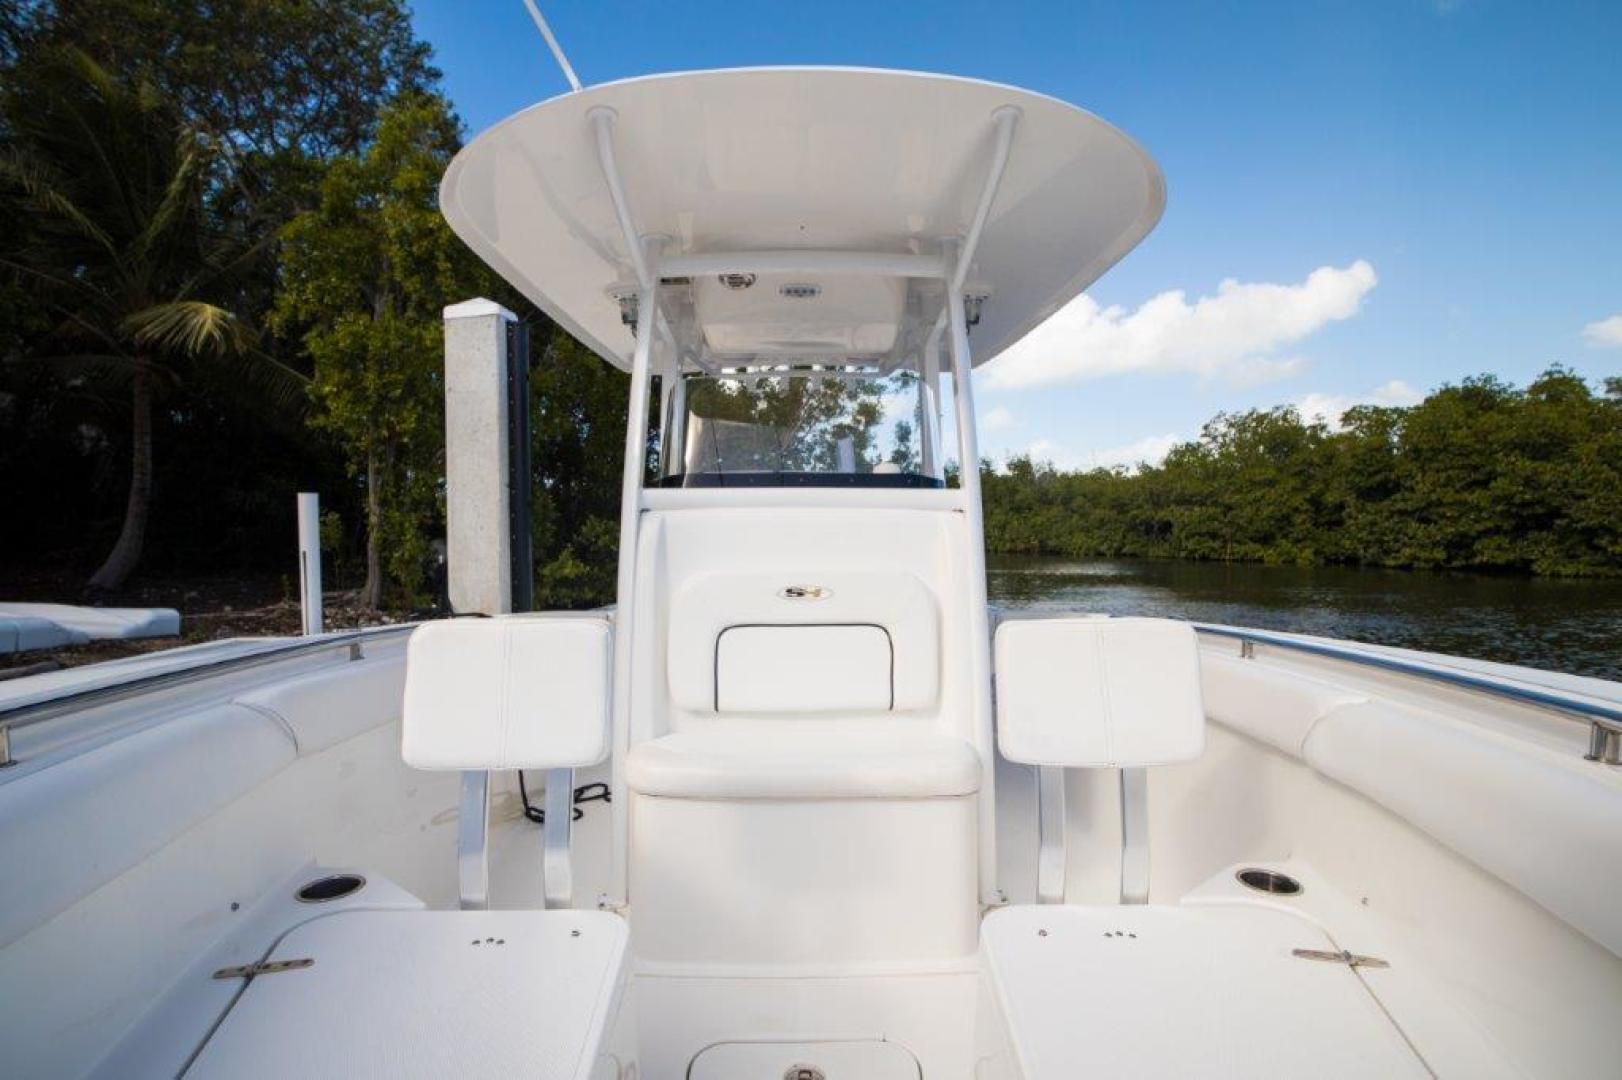 Sea Hunt-Gamefisherman 2013-No Name 29 Sea Hunt Key Largo-Florida-United States-Console-1562266 | Thumbnail